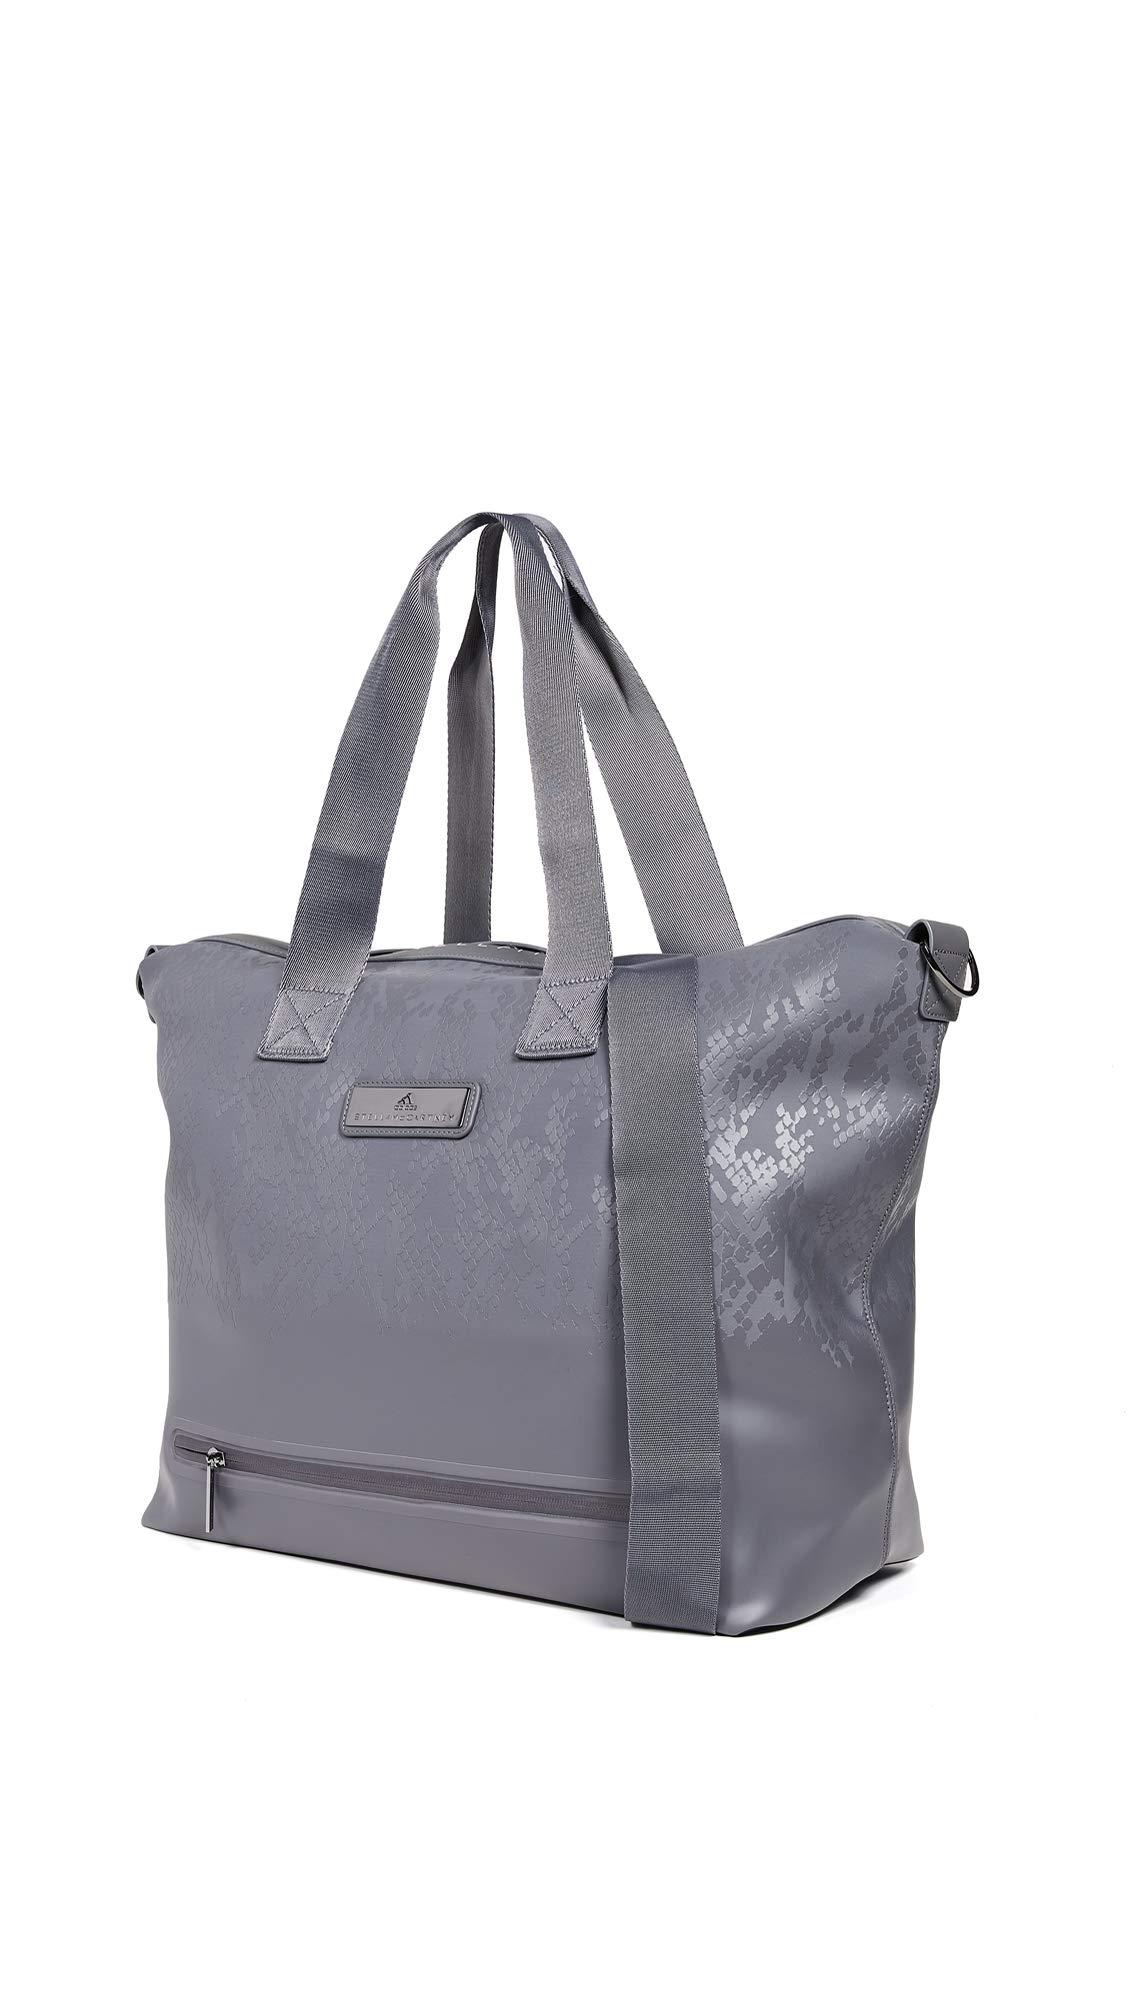 adidas by Stella McCartney Women's Studio Bag Tote, Granite, Grey, Print, One Size